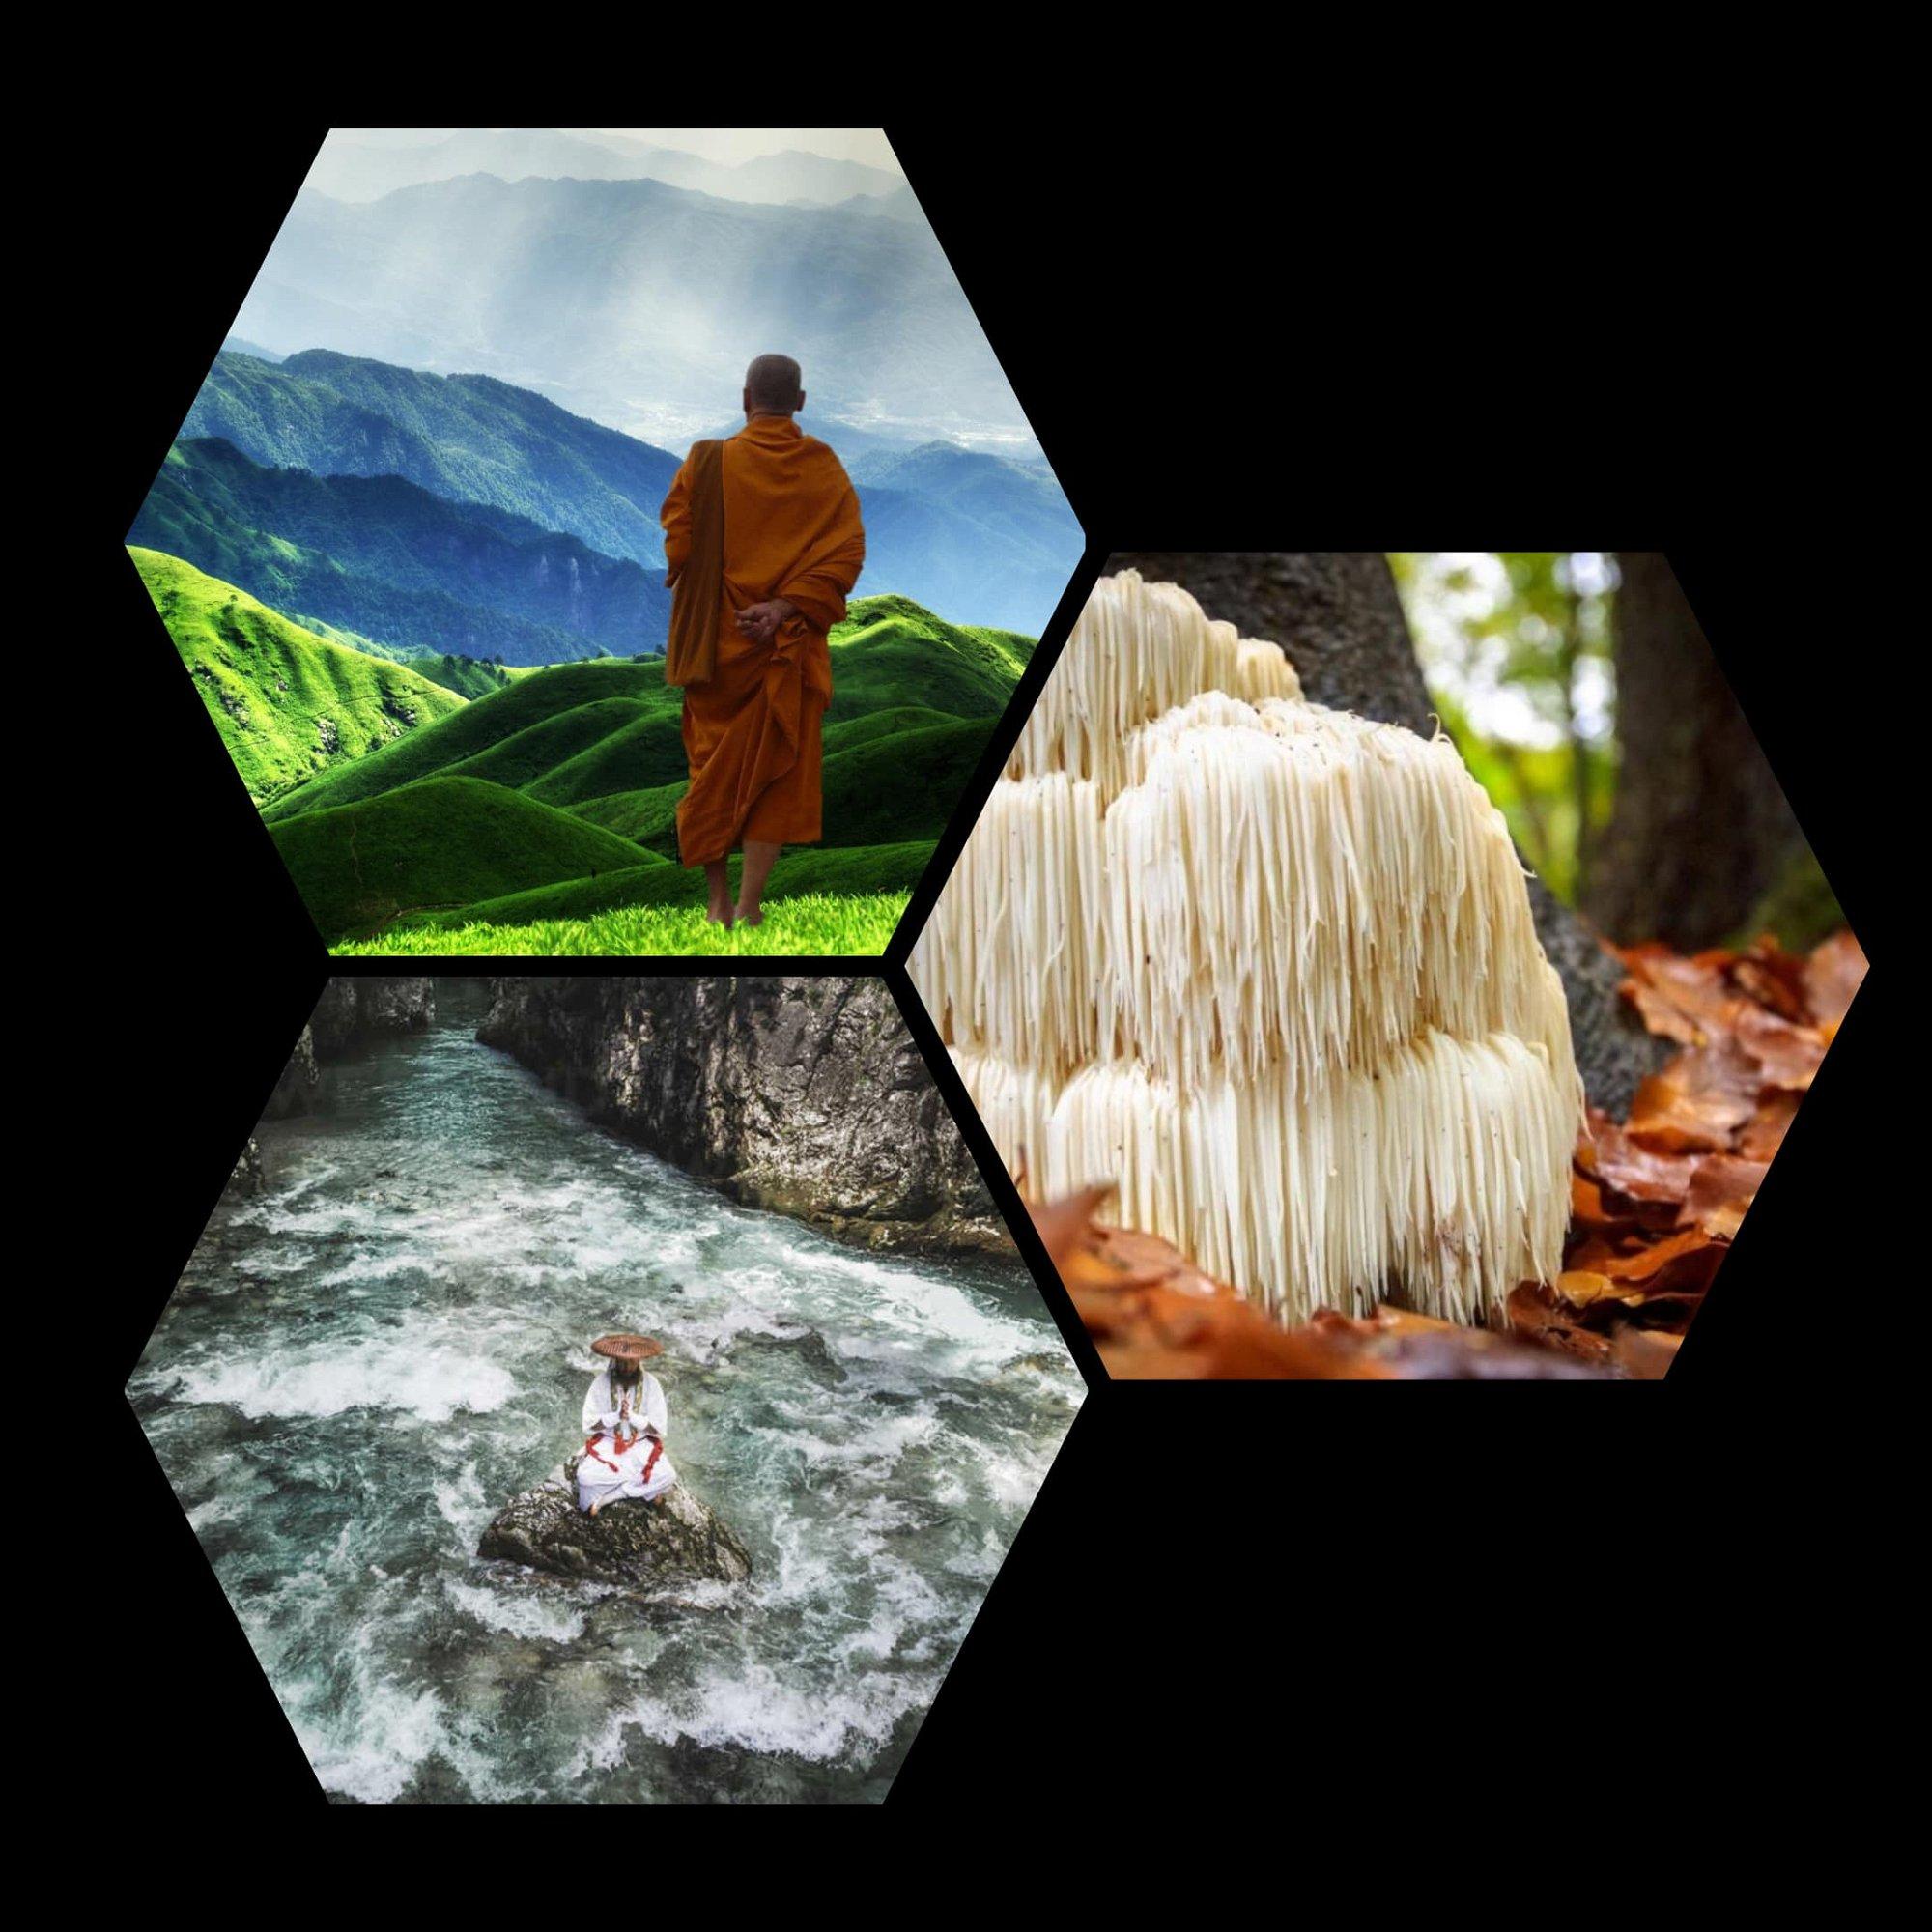 lions mane mushroom Buddhist monk